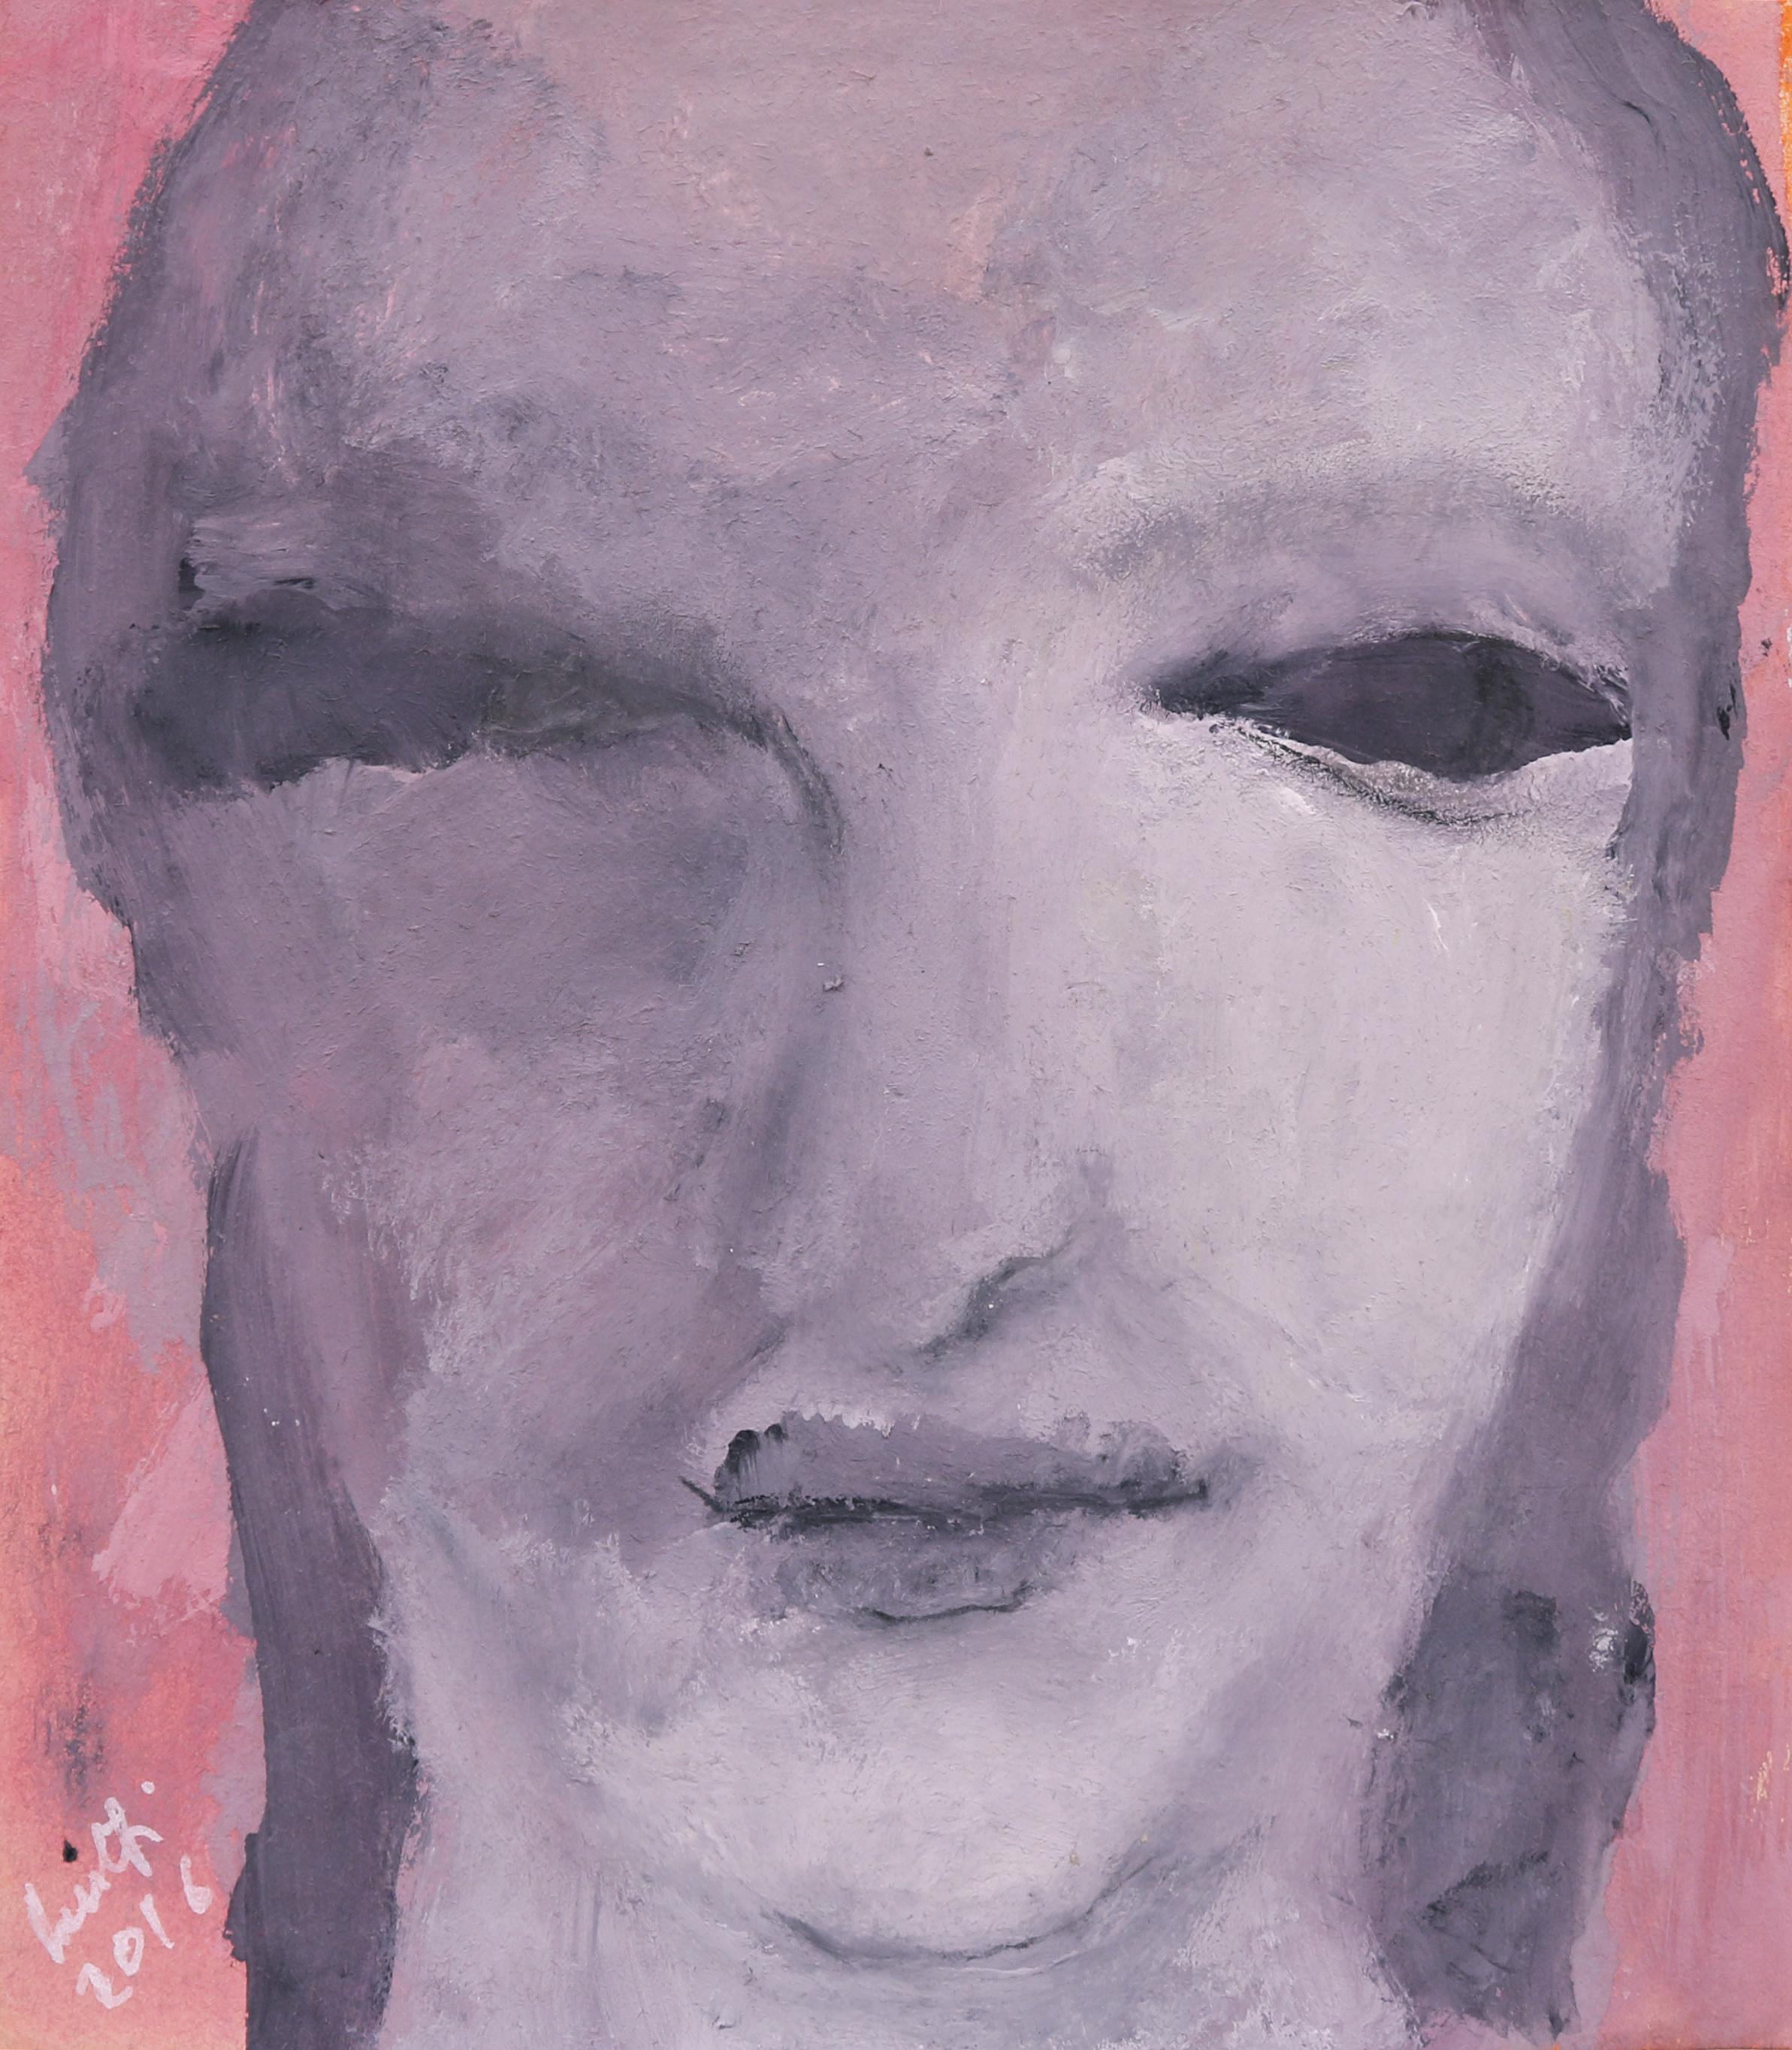 Huda Lutfi at Gypsum Gallery